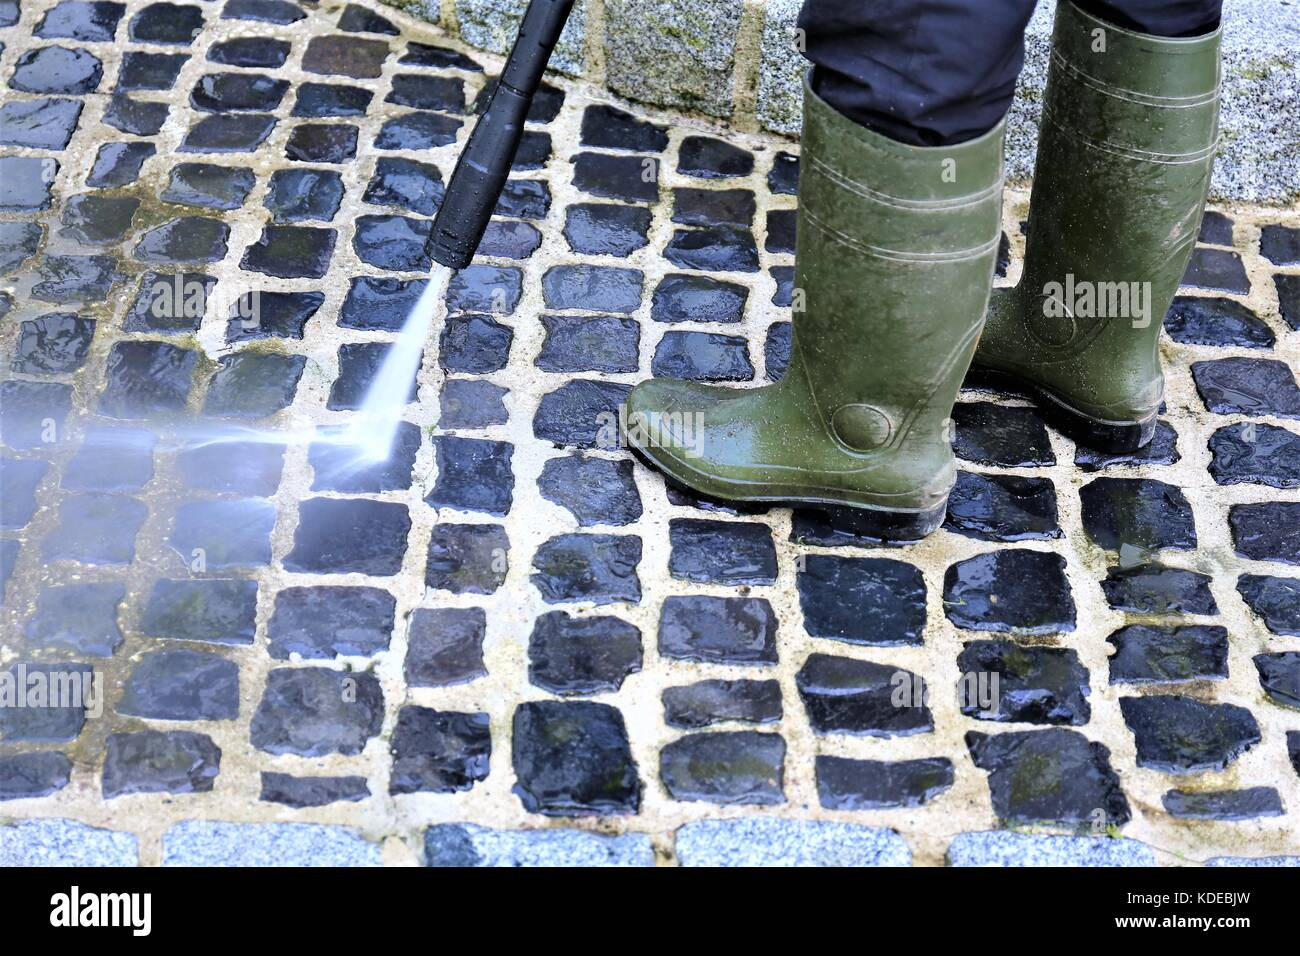 Une image de walkway nettoyage - nettoyeur haute pression Photo Stock